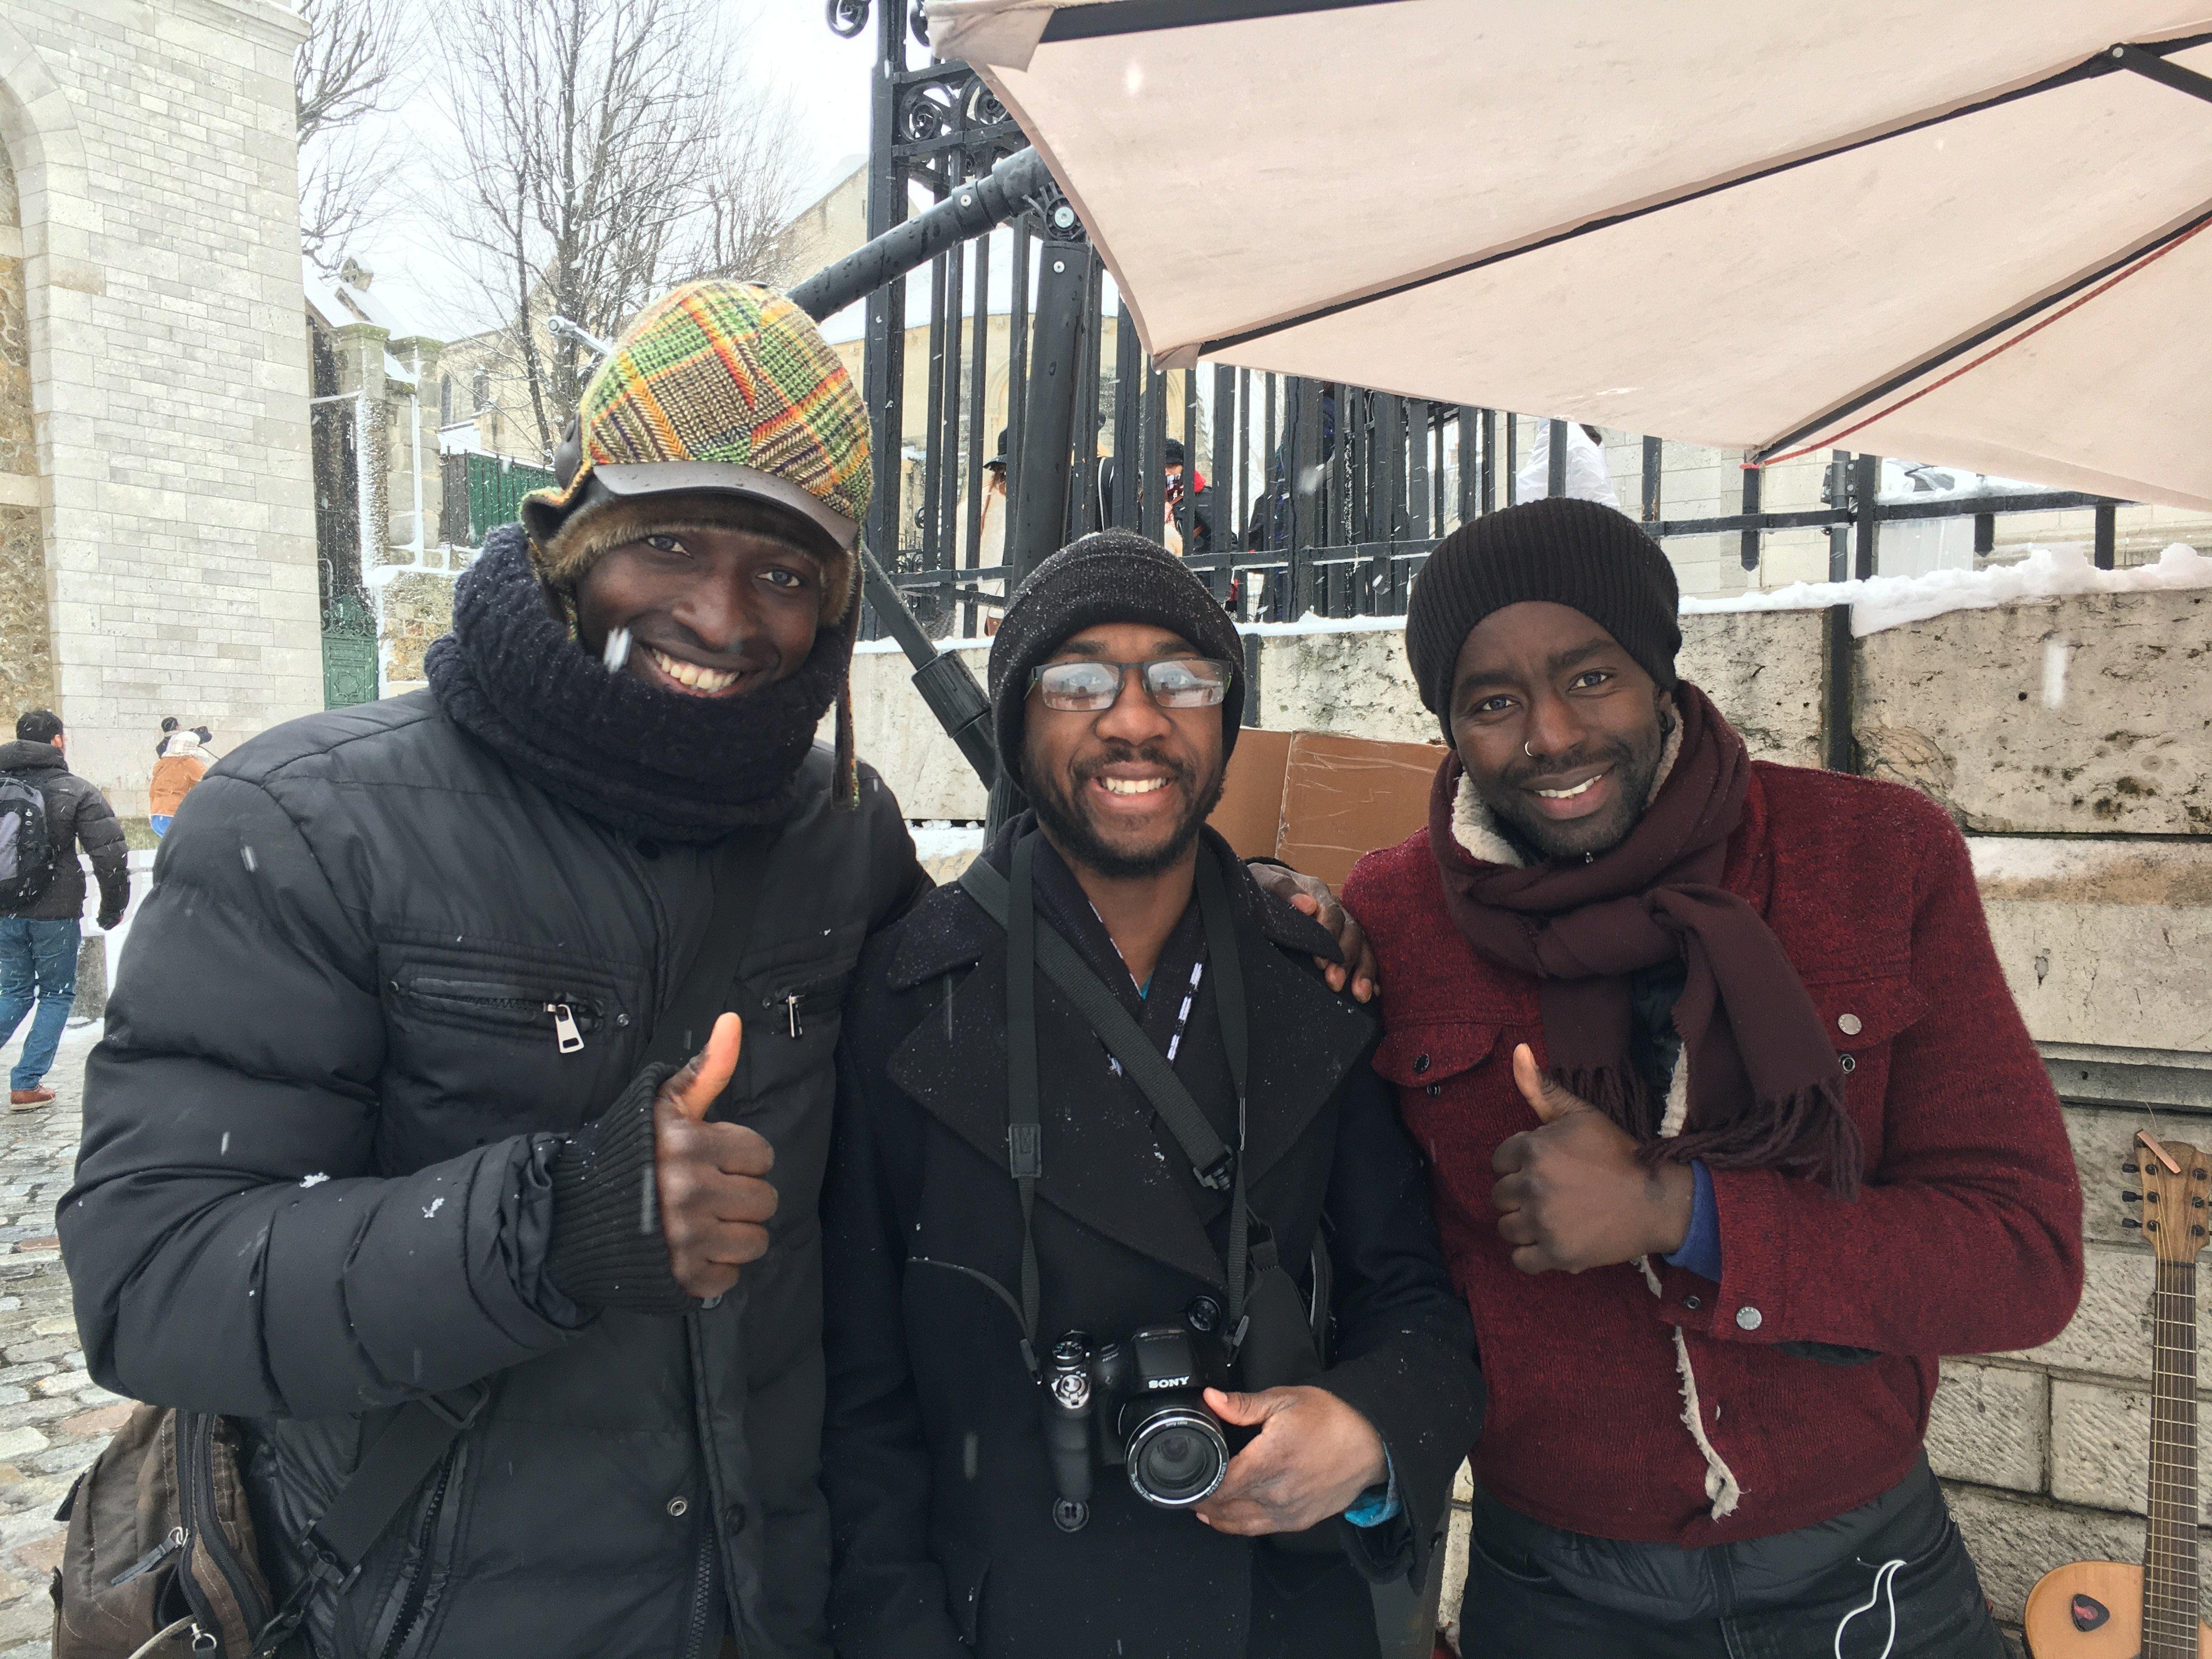 Floyd with friends in Paris